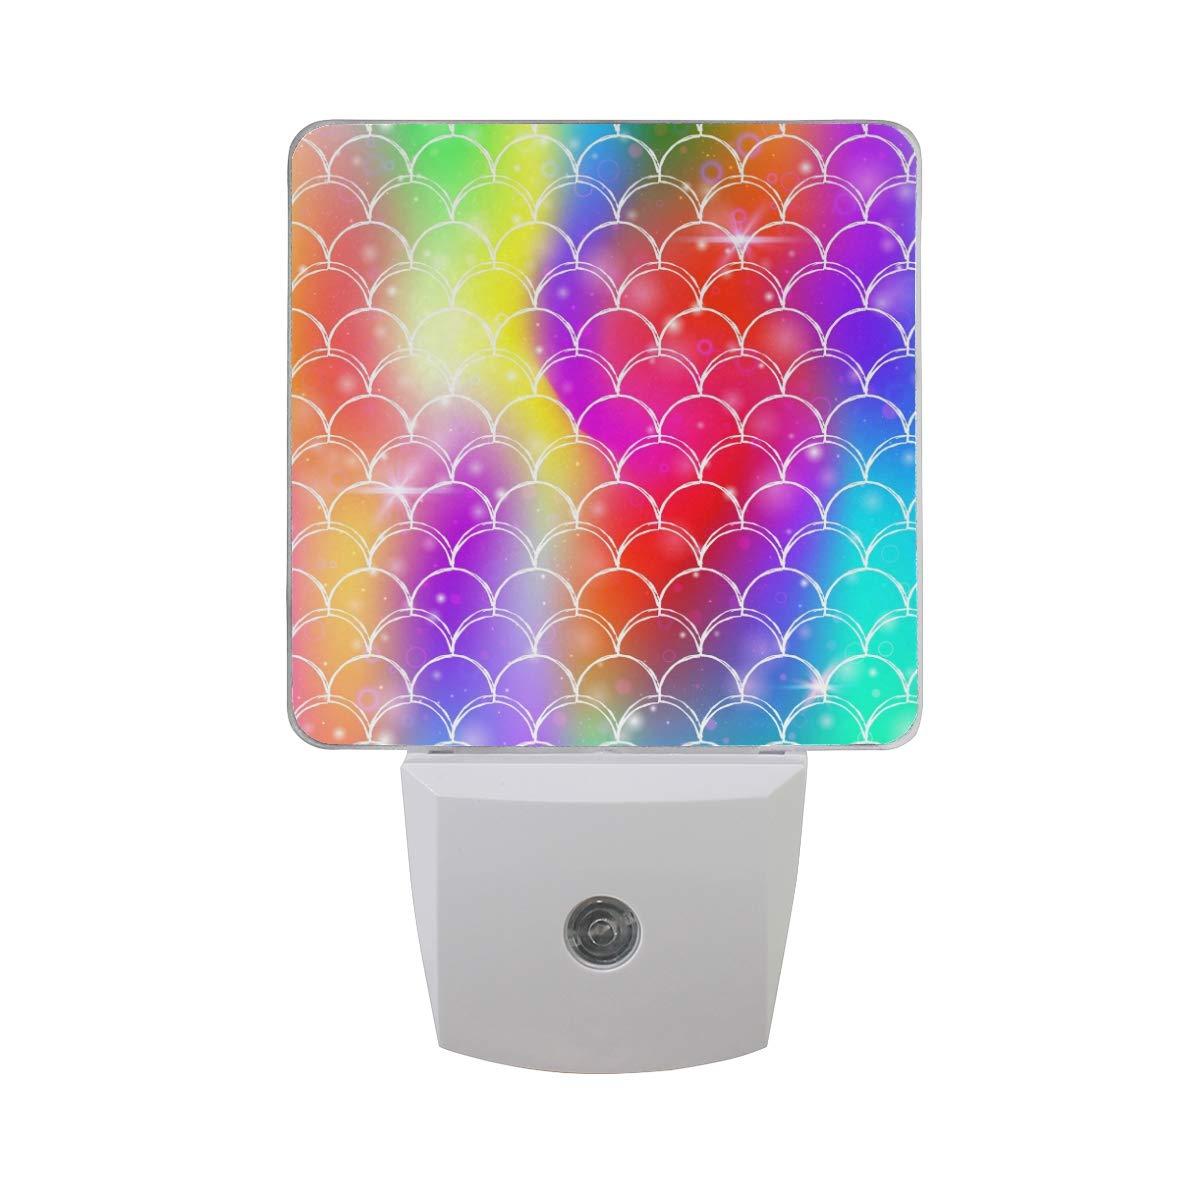 Linomo LED Night Light Lamp Colorful Mermaid Scale Auto Senor Nightlight Plug in for Kids Adults Boys Girls Bedroom Decor, 2 Pack